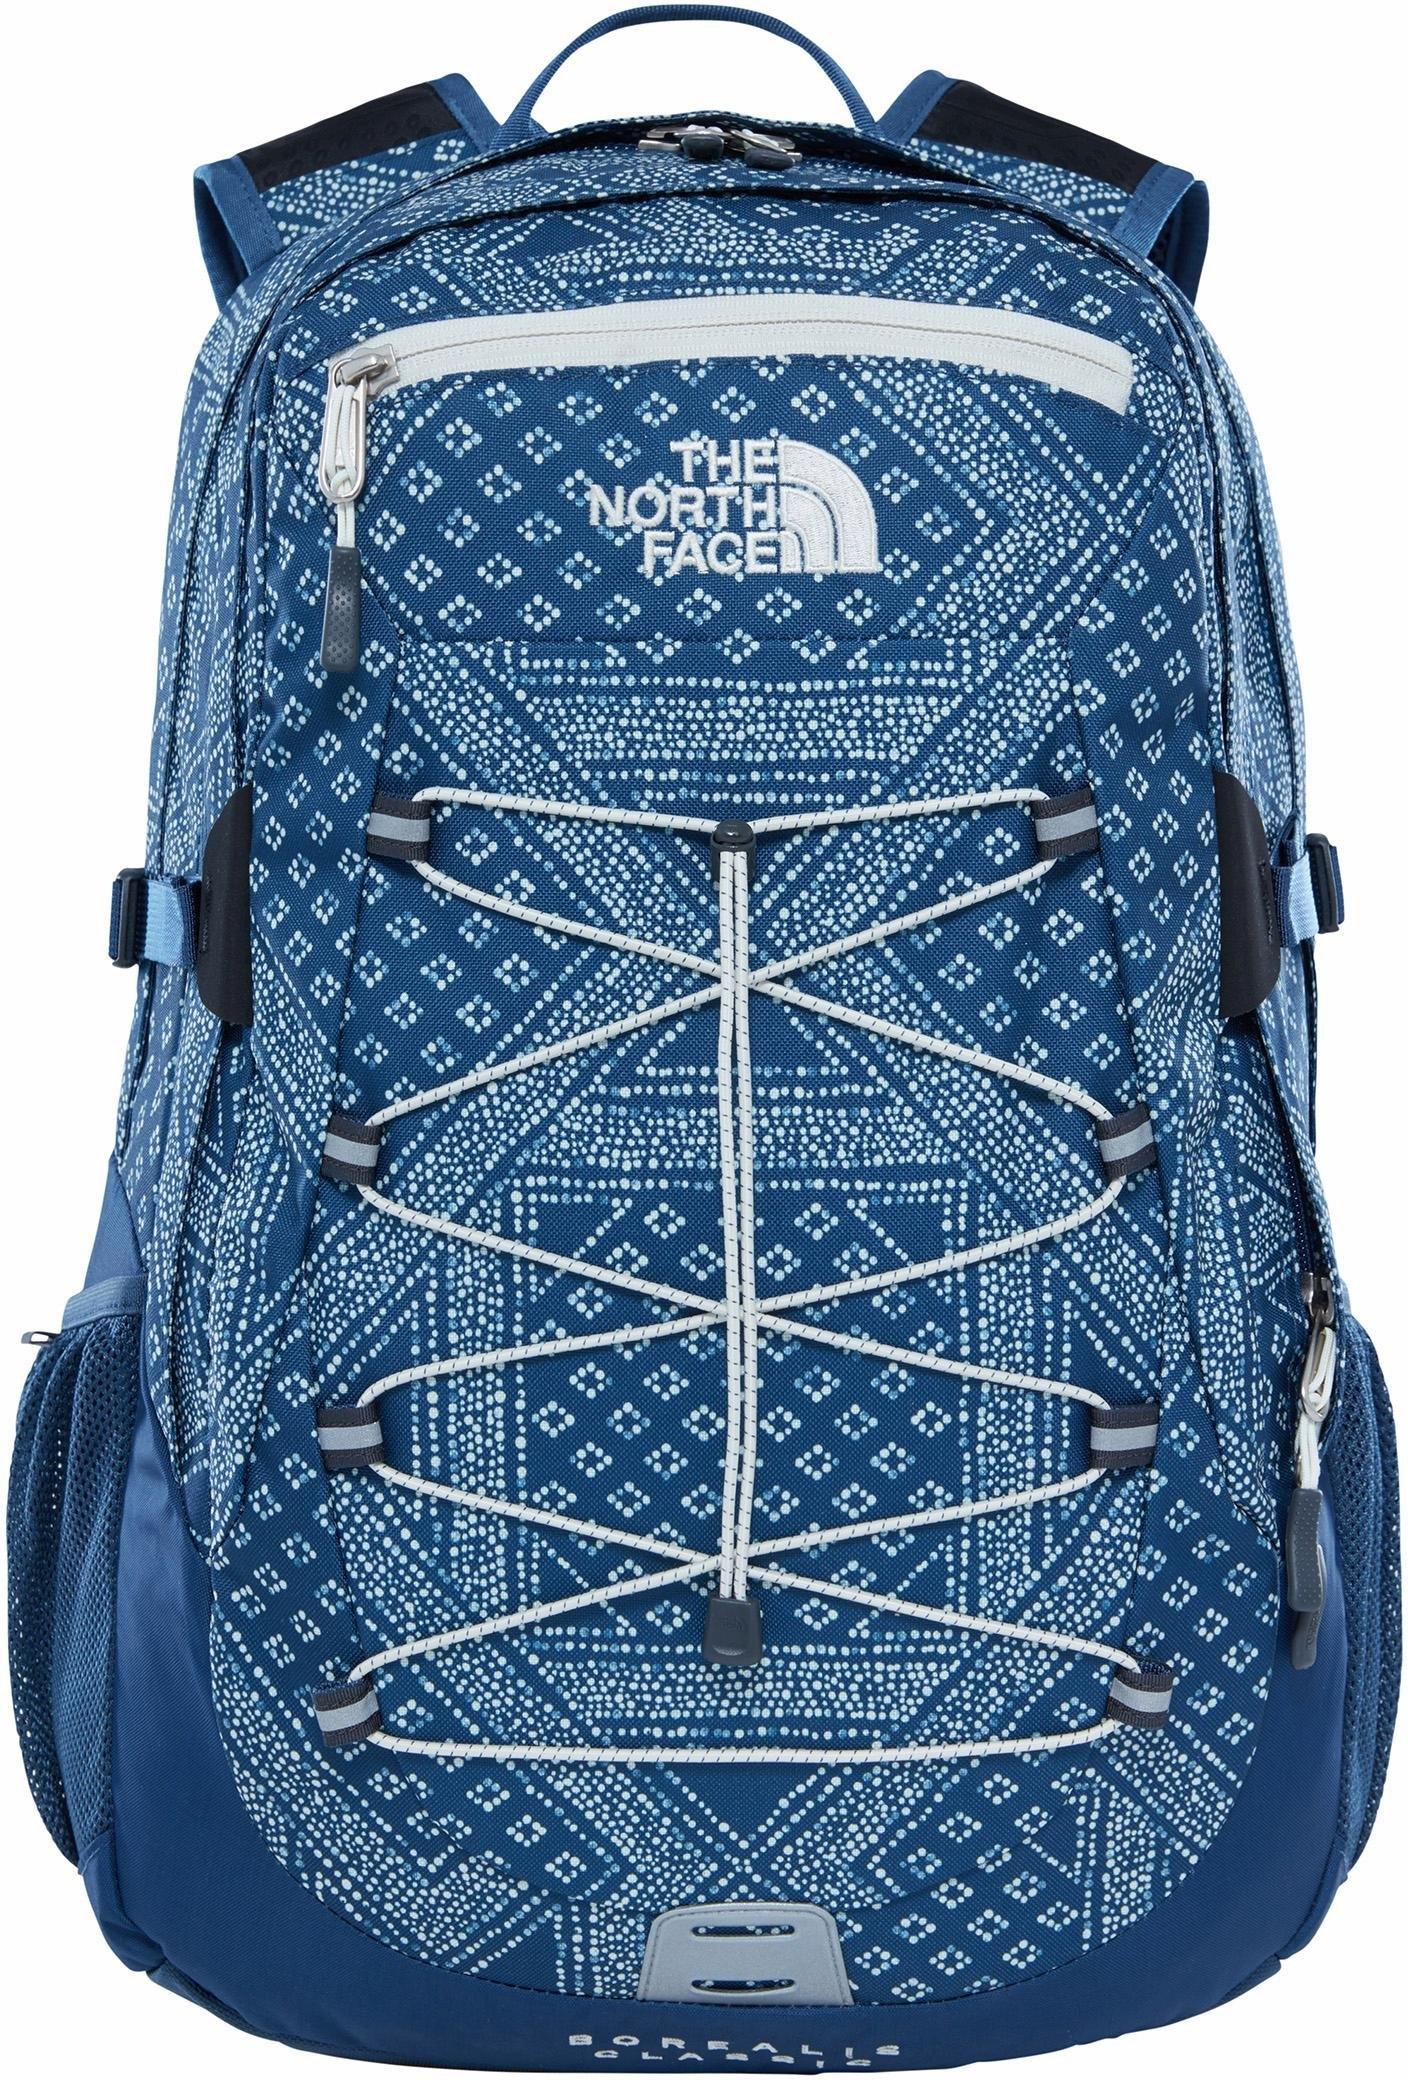 The North Face rugzak met laptopvak (15 inch), »Borealis Classic« nu online kopen bij OTTO